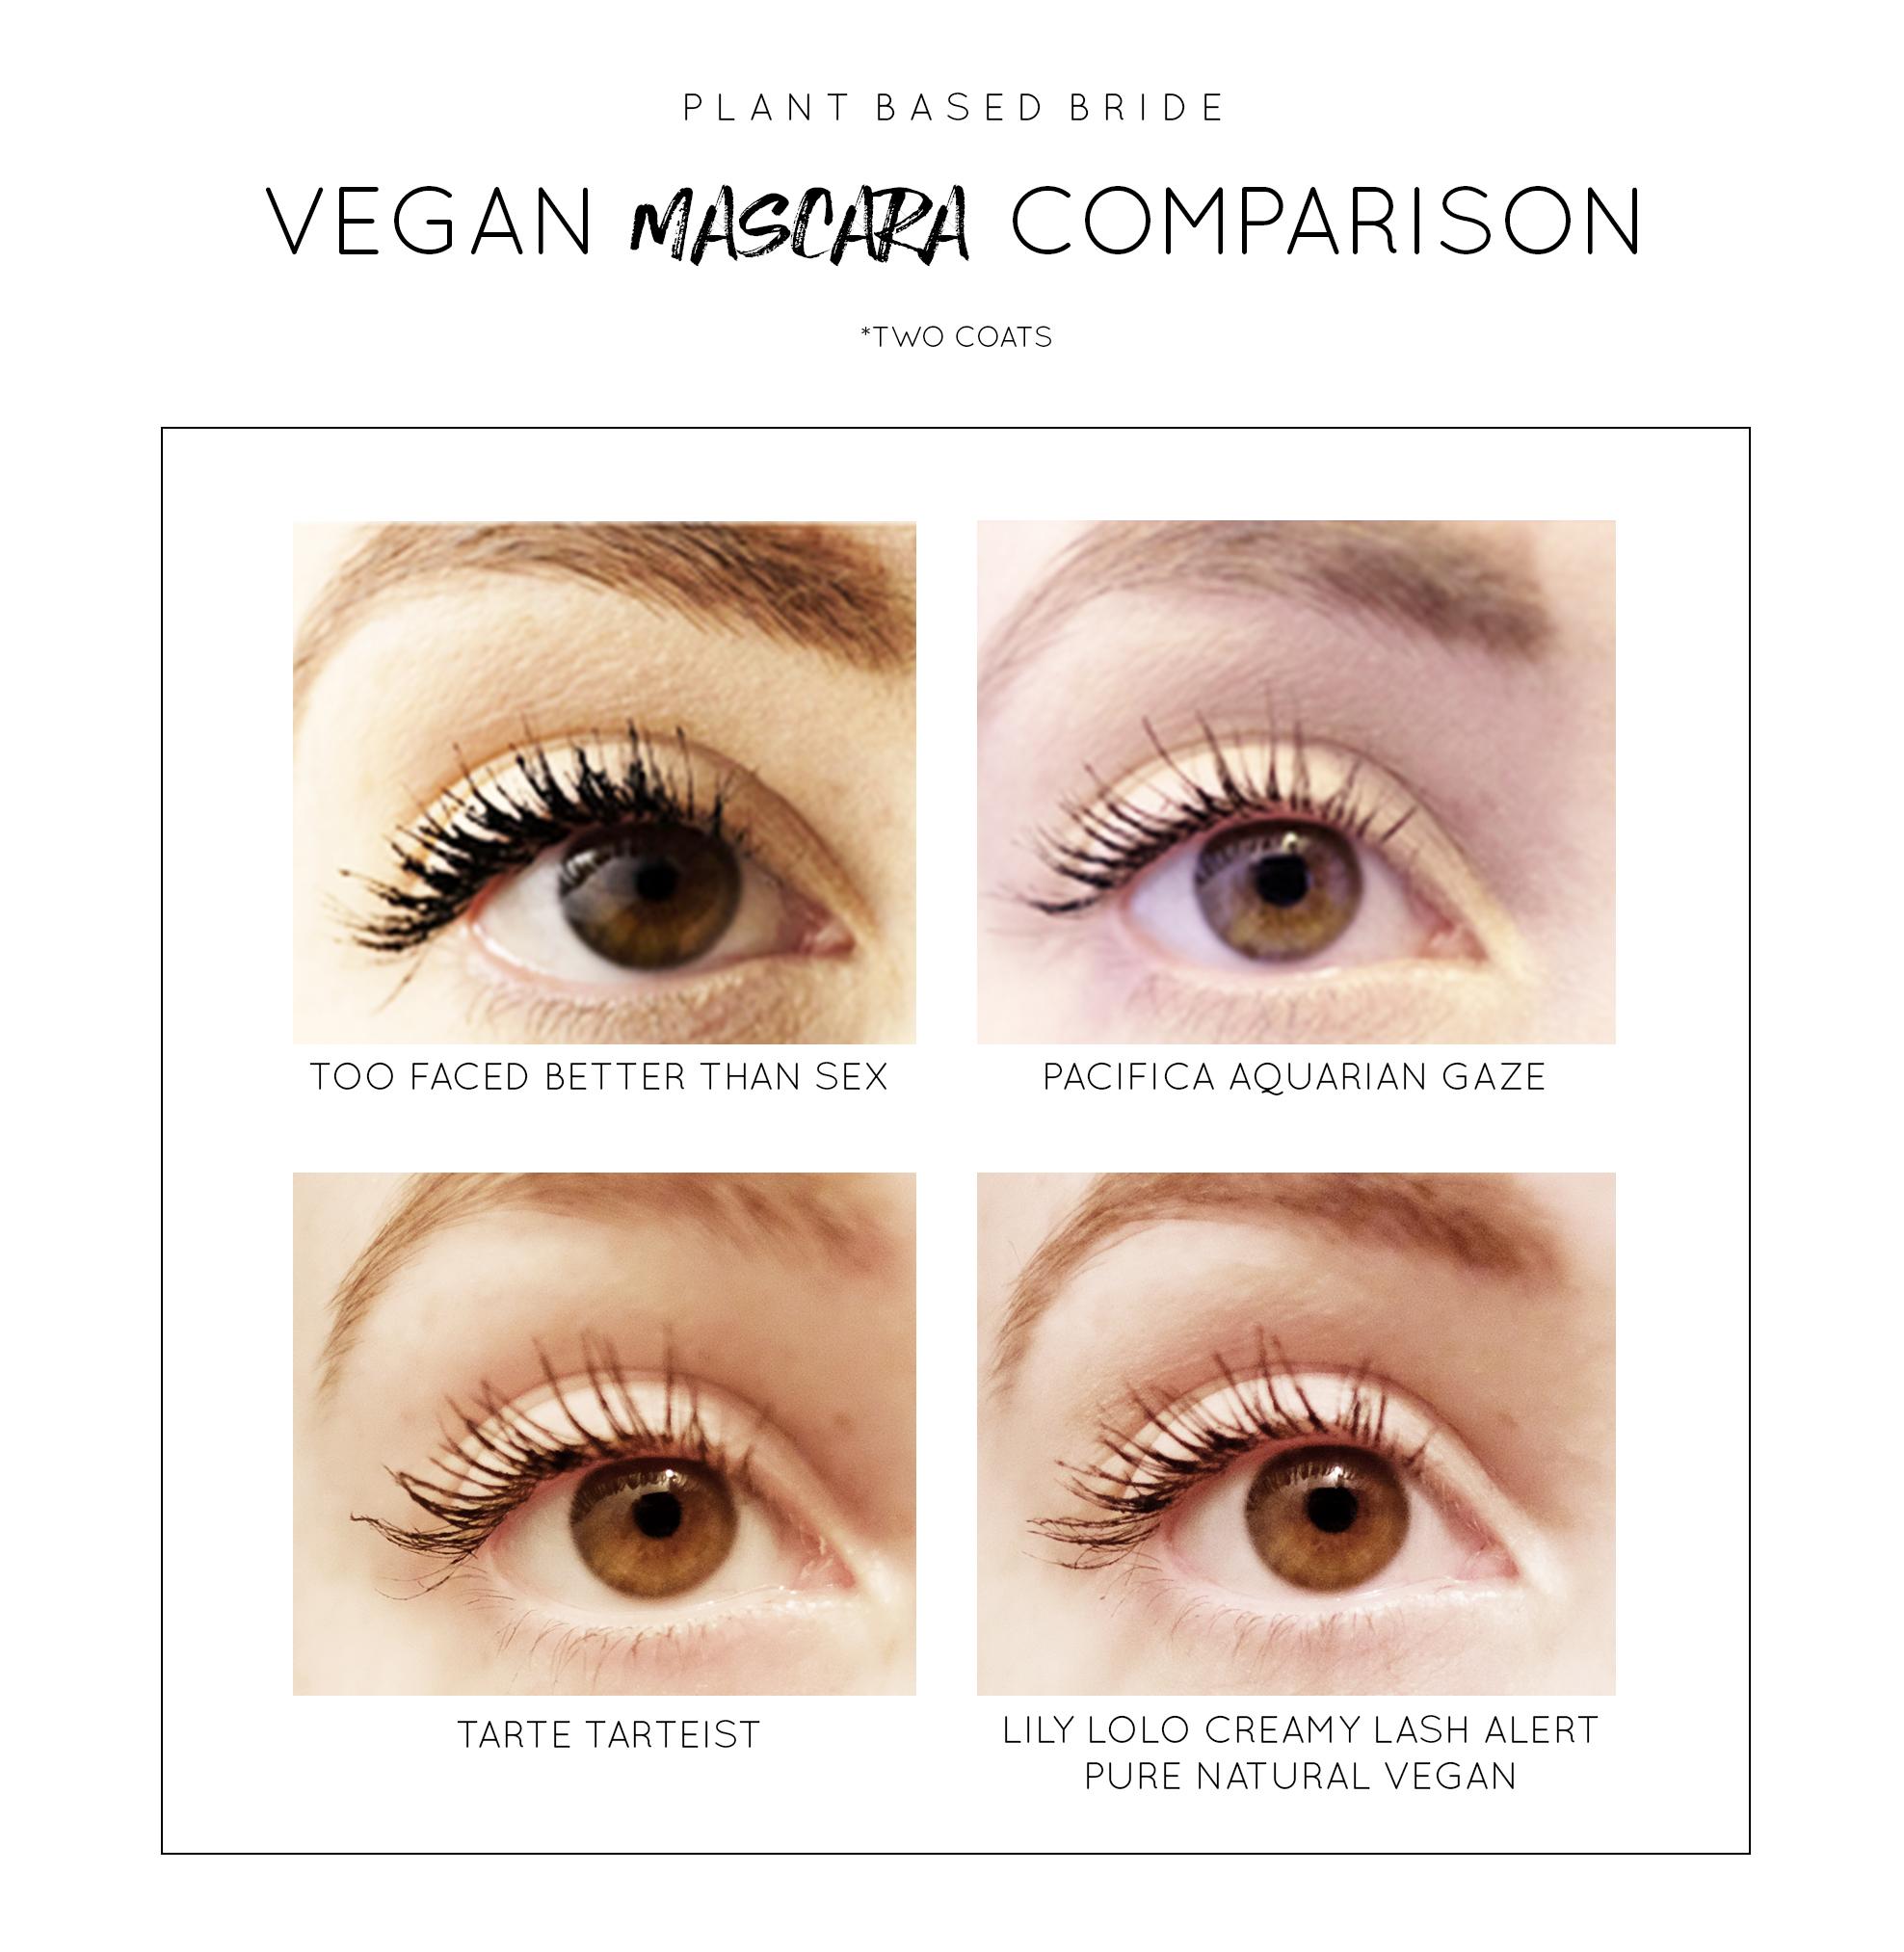 Vegan Mascara Comparison // Plant Based Bride